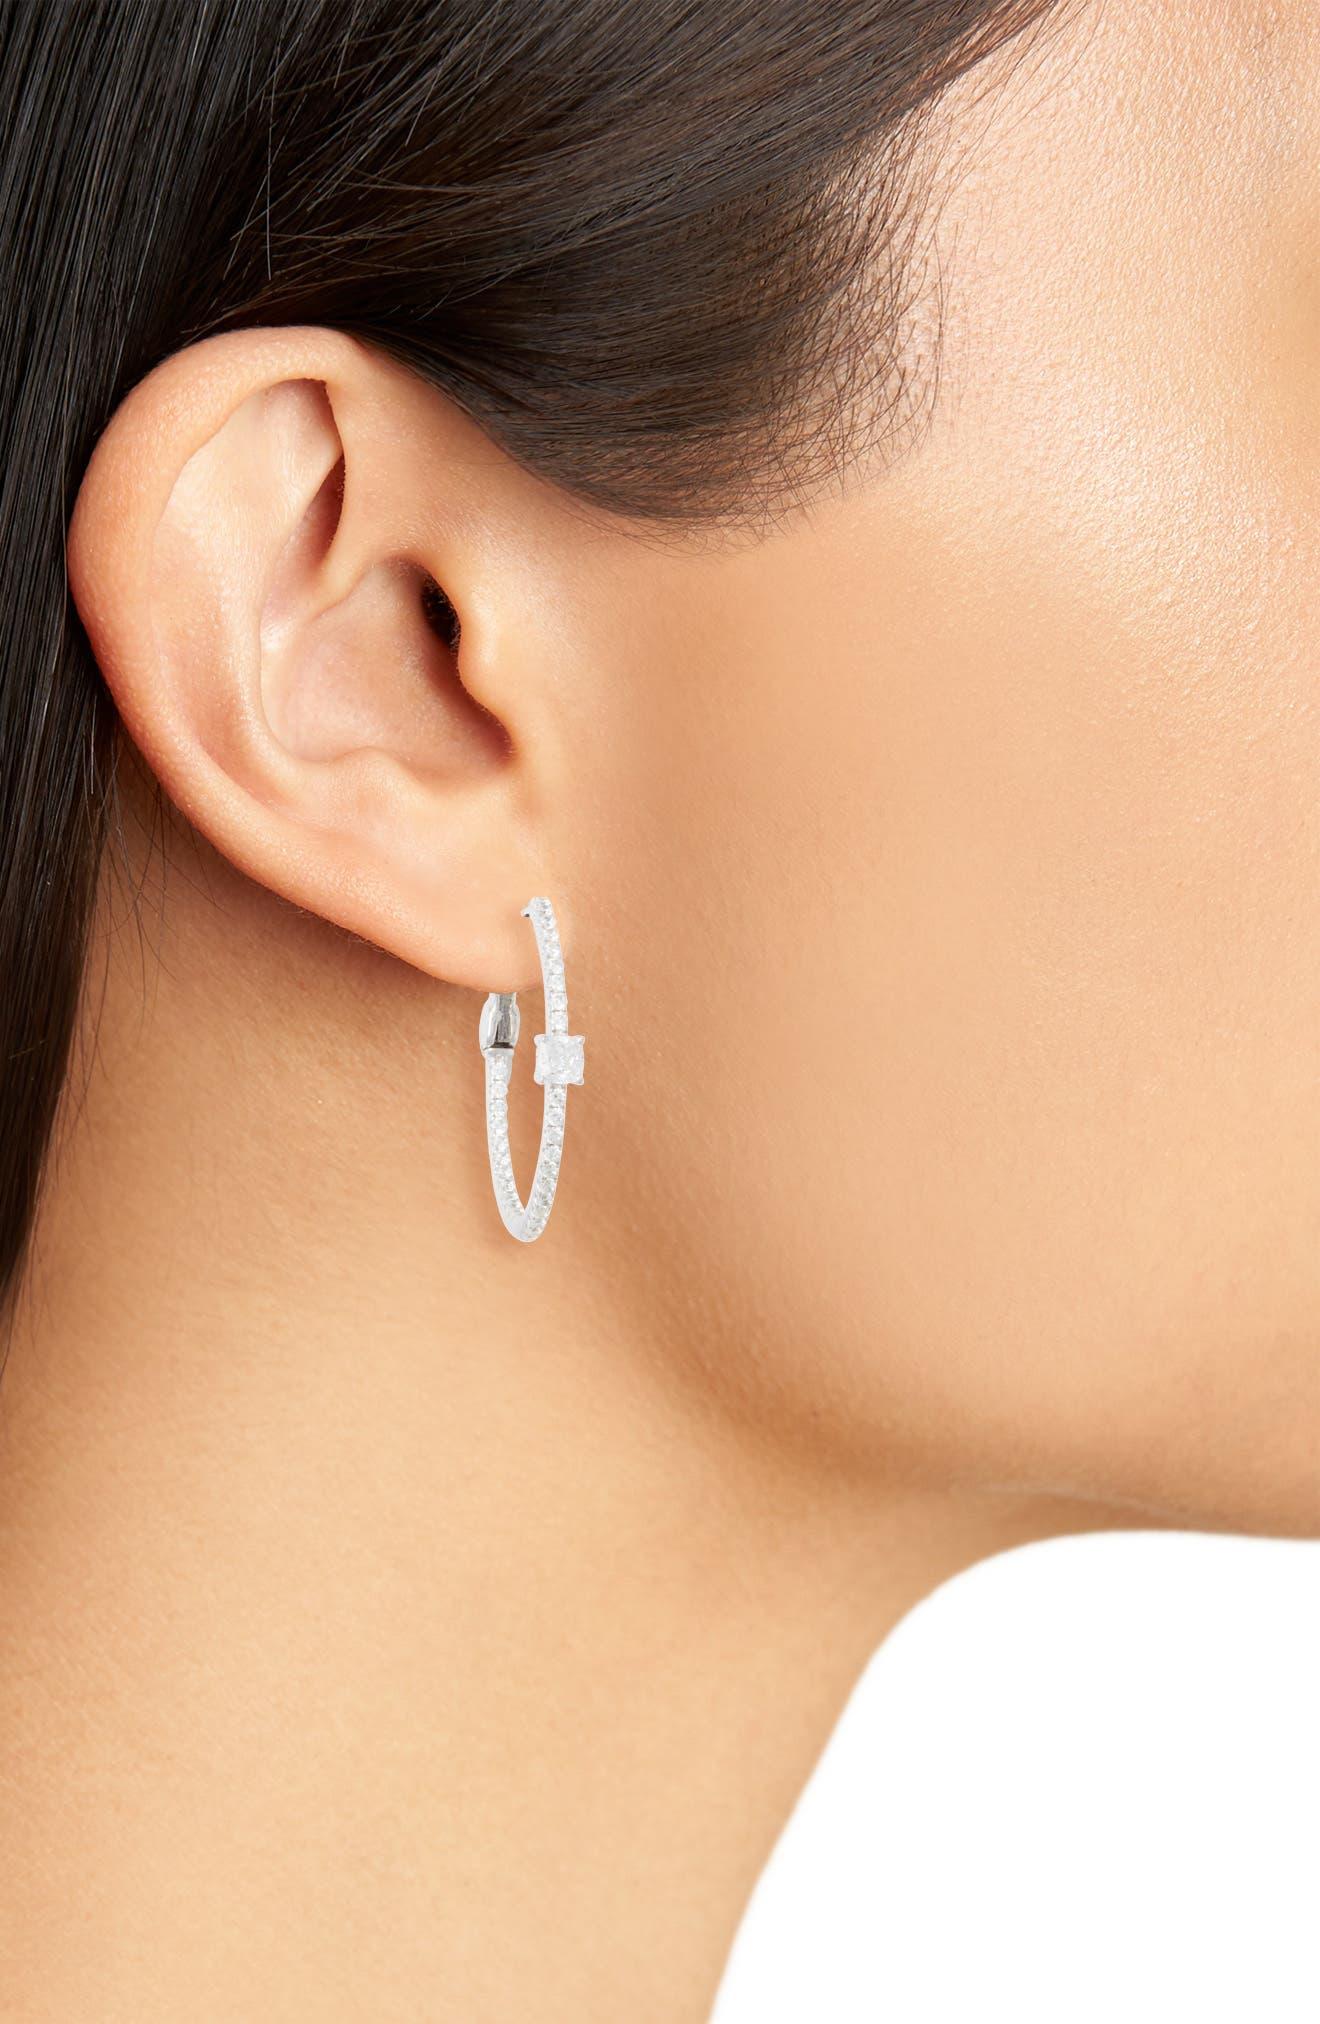 Simulated Diamond Hoop Earrings,                             Alternate thumbnail 2, color,                             SILVER/ CLEAR